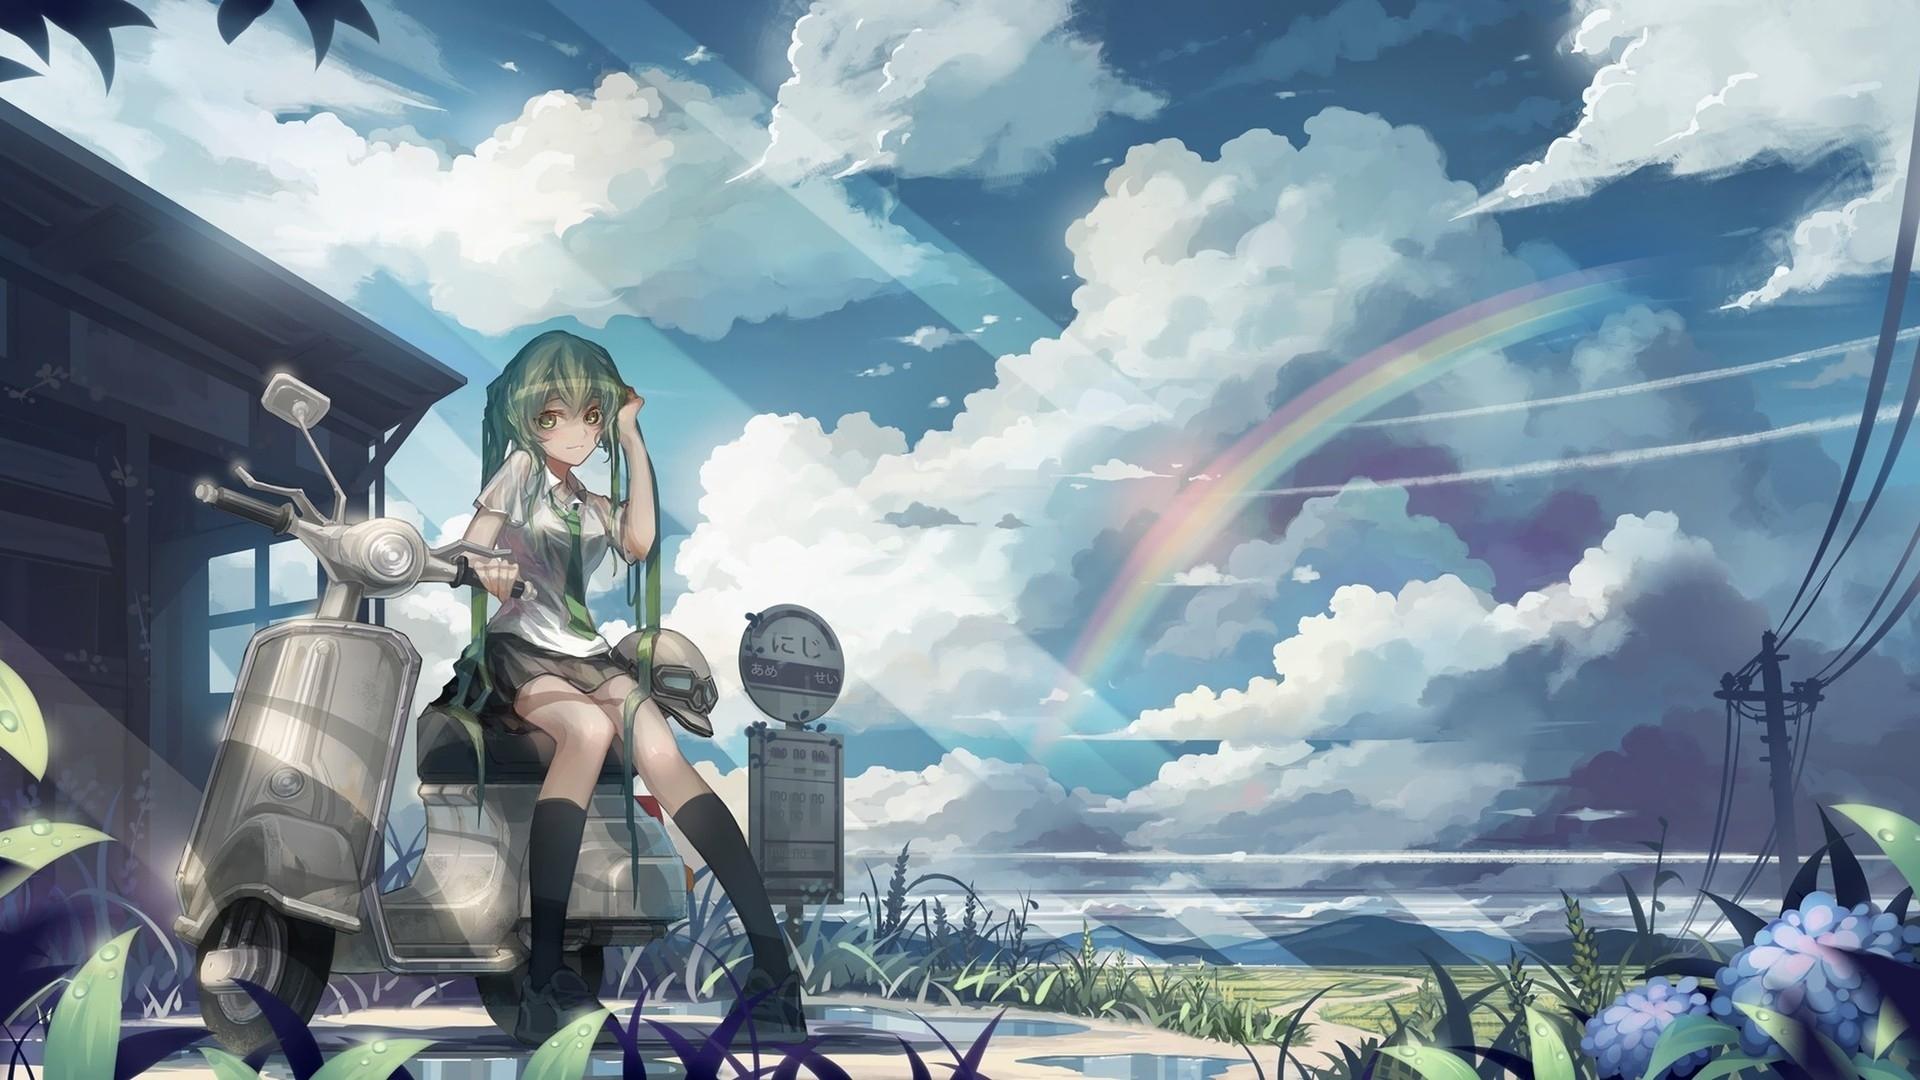 Gallery Anime Art Wallpaper Part